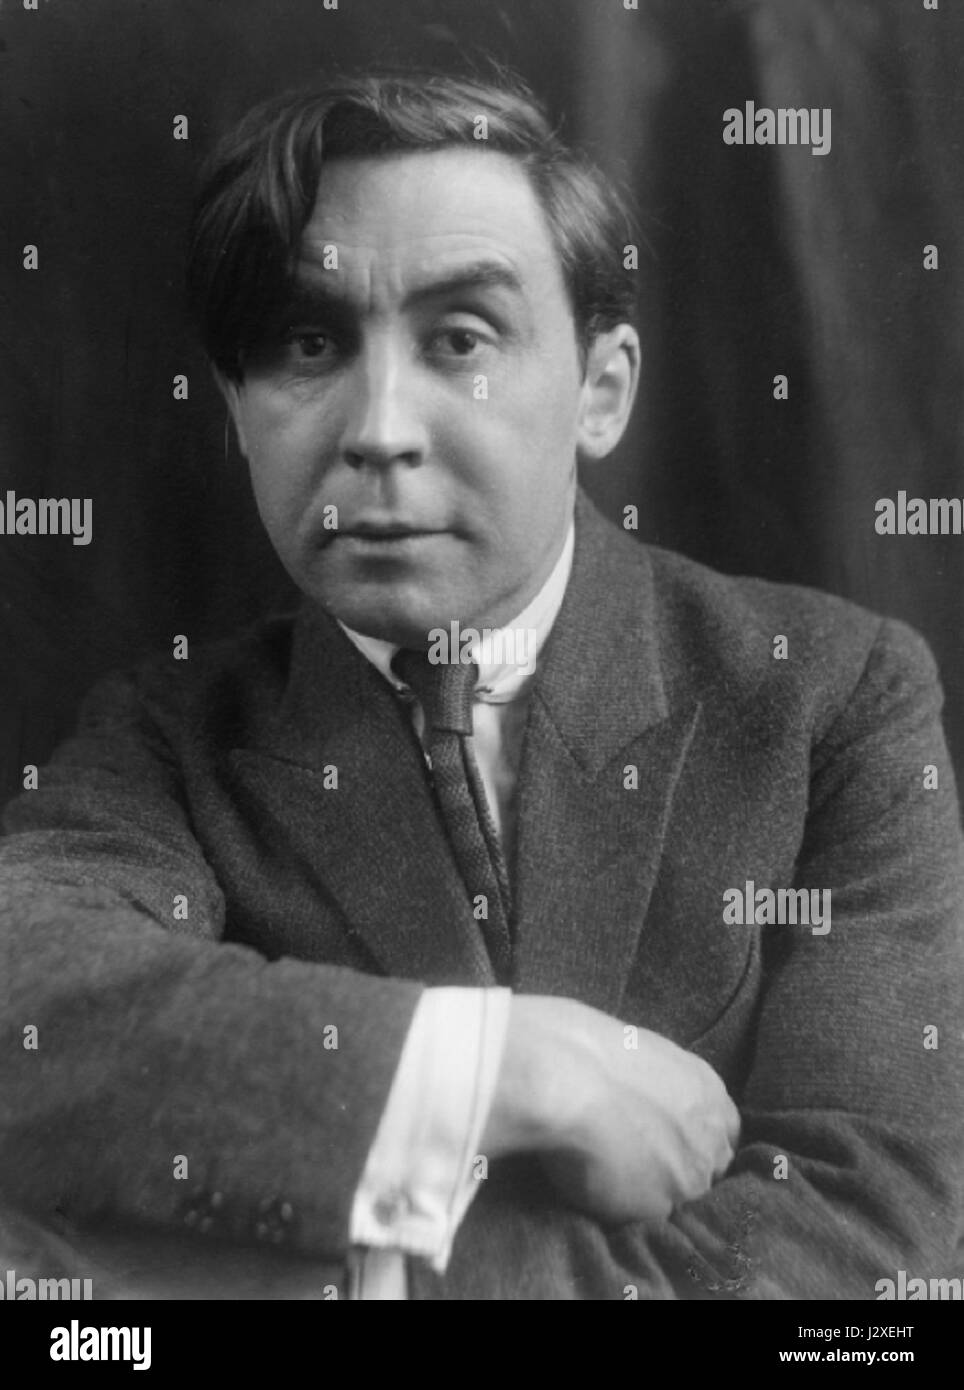 Albert Gleizes, c.1920, photograph by Pierre Choumoff. - Stock Image